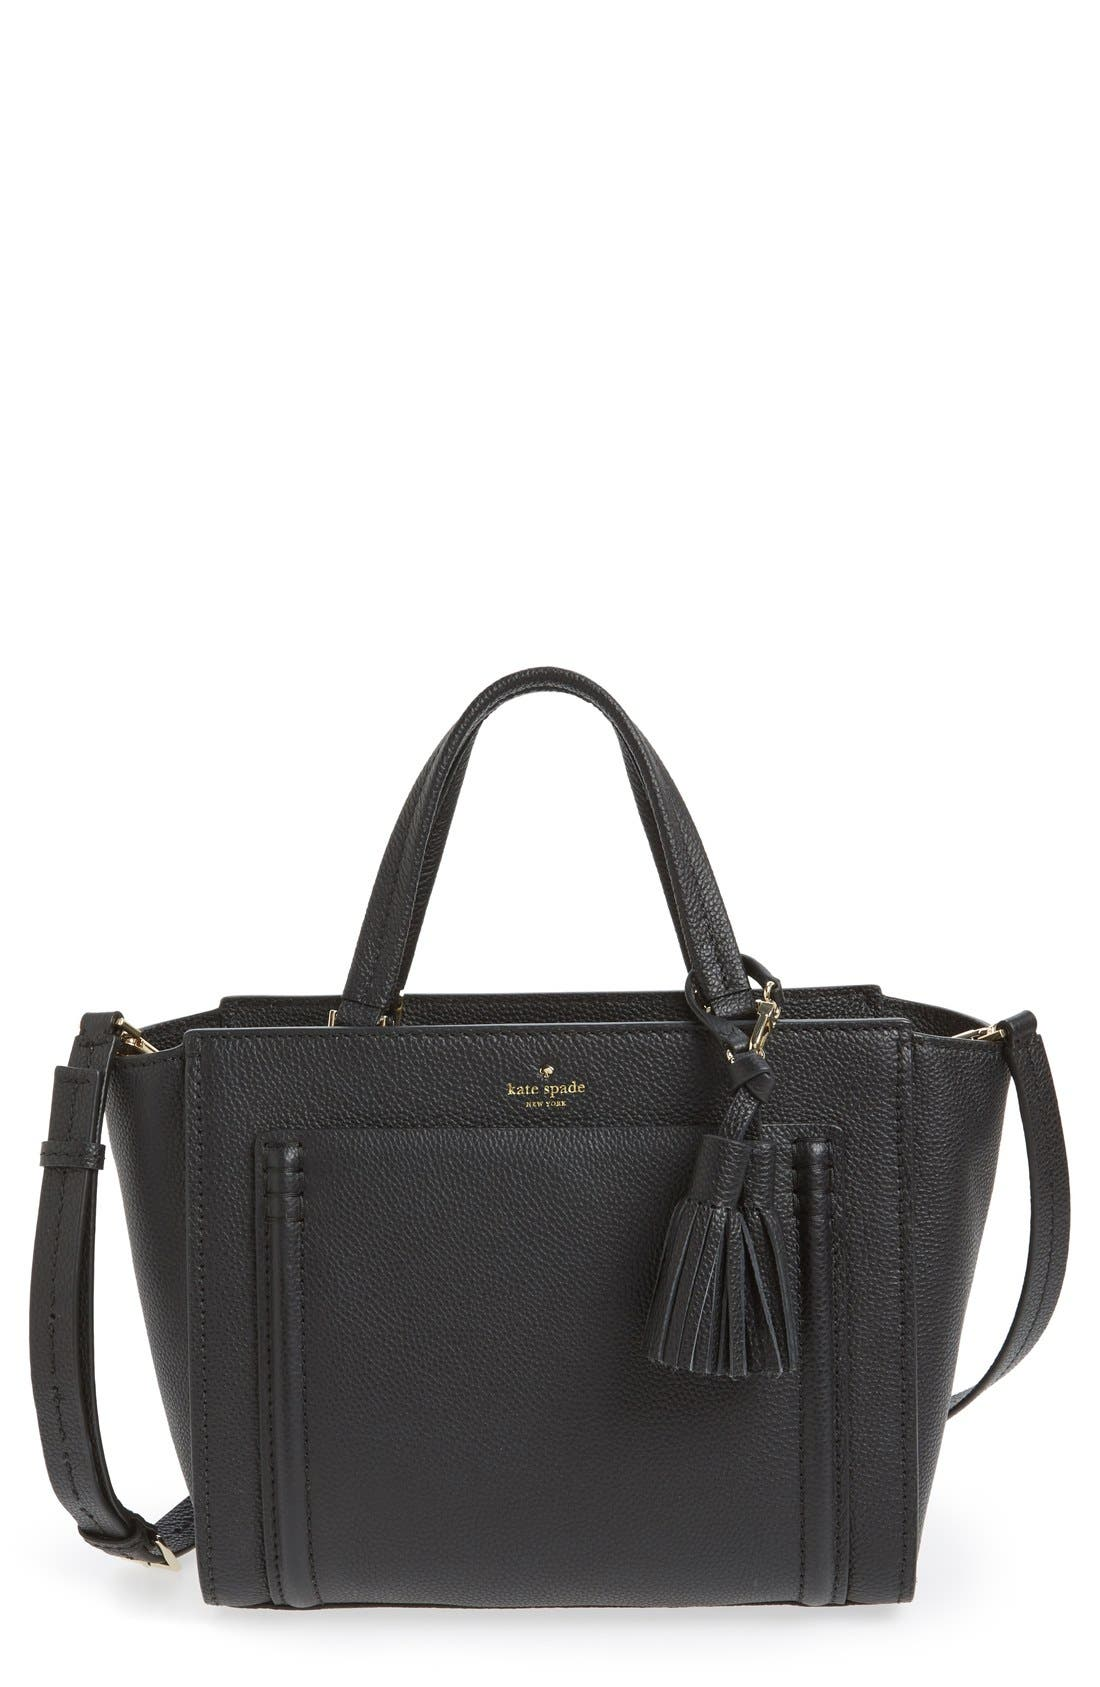 Main Image - kate spade new york 'orchard street - dillon' tassel leather satchel